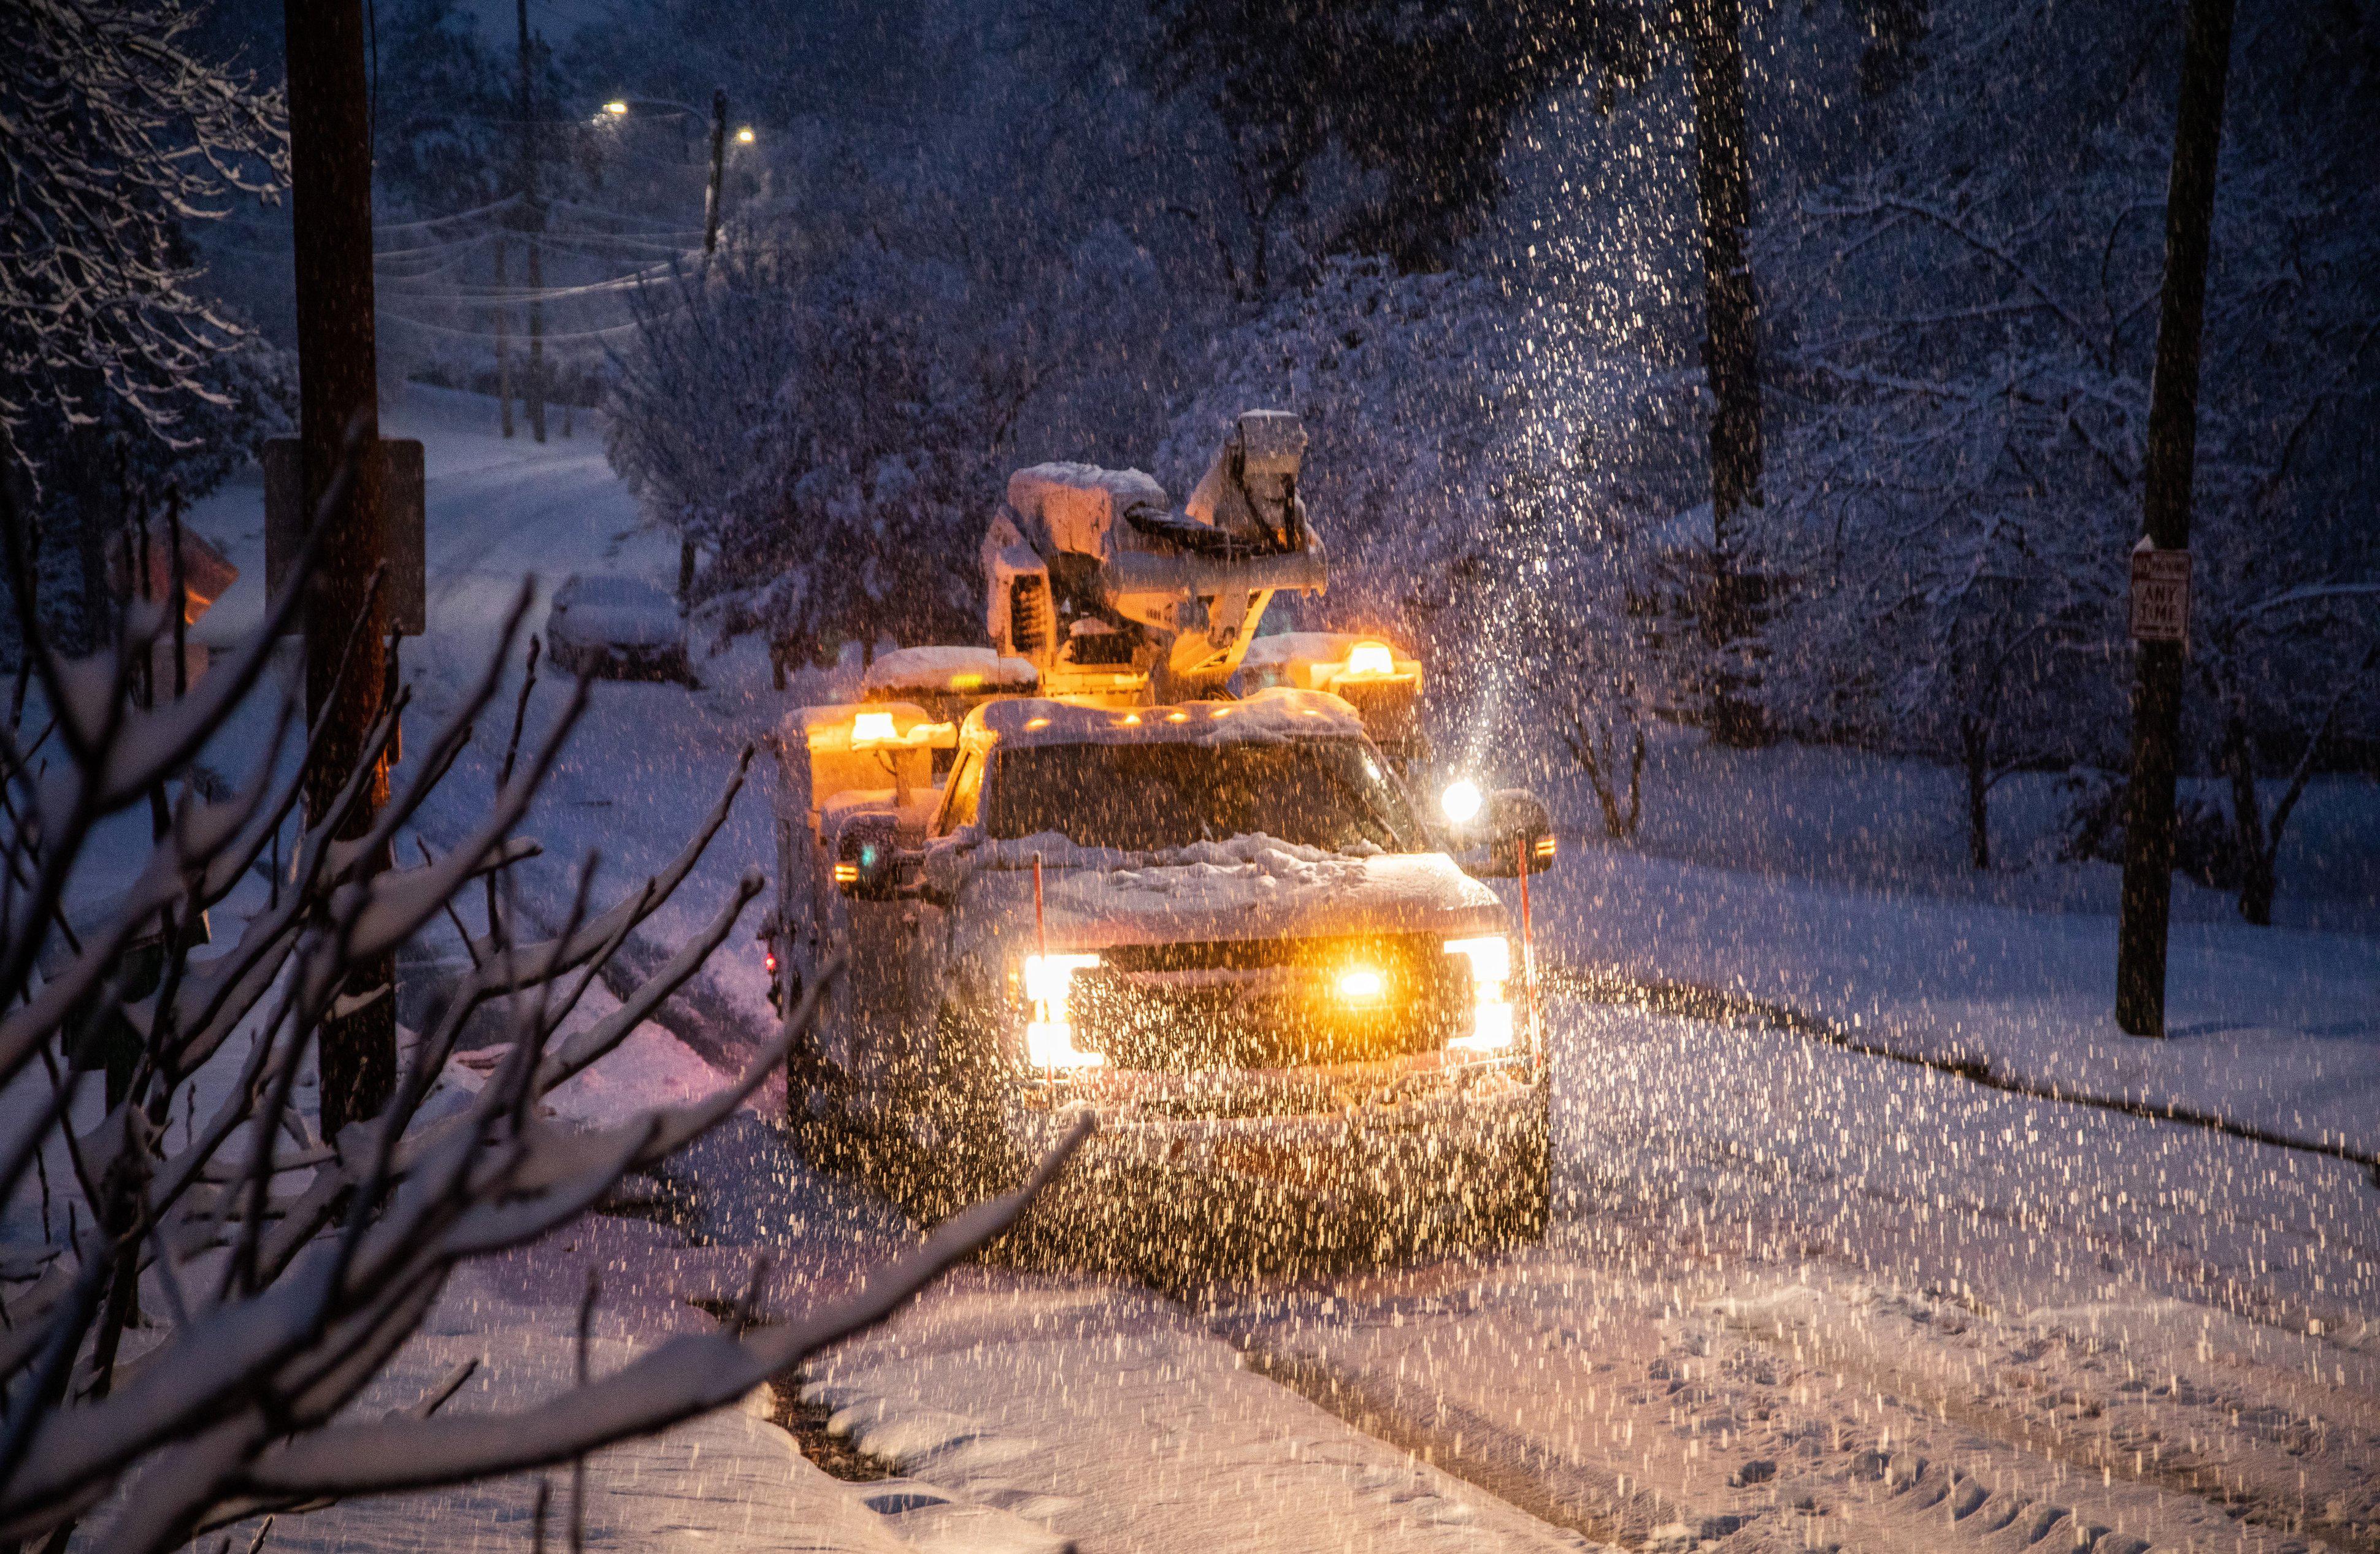 Winter storm hits parts of Georgia, Carolinas and Virginia